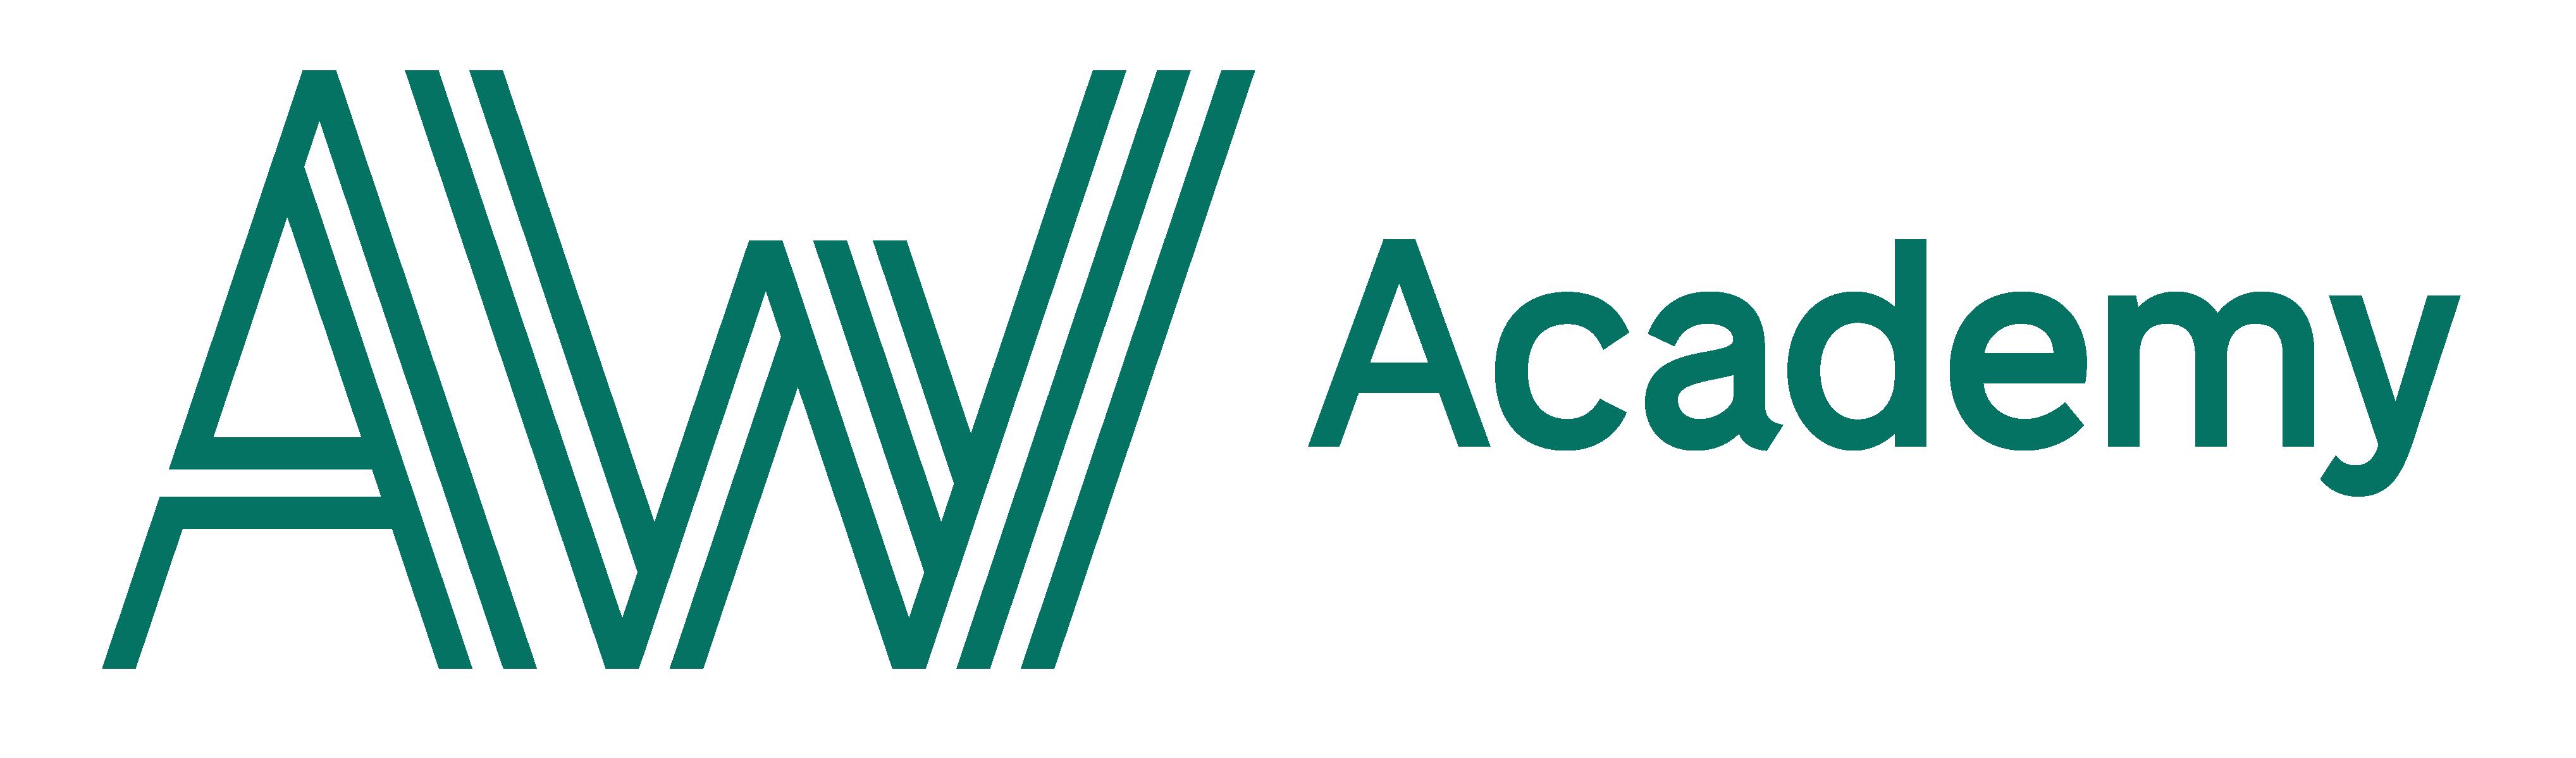 AW Academy logo